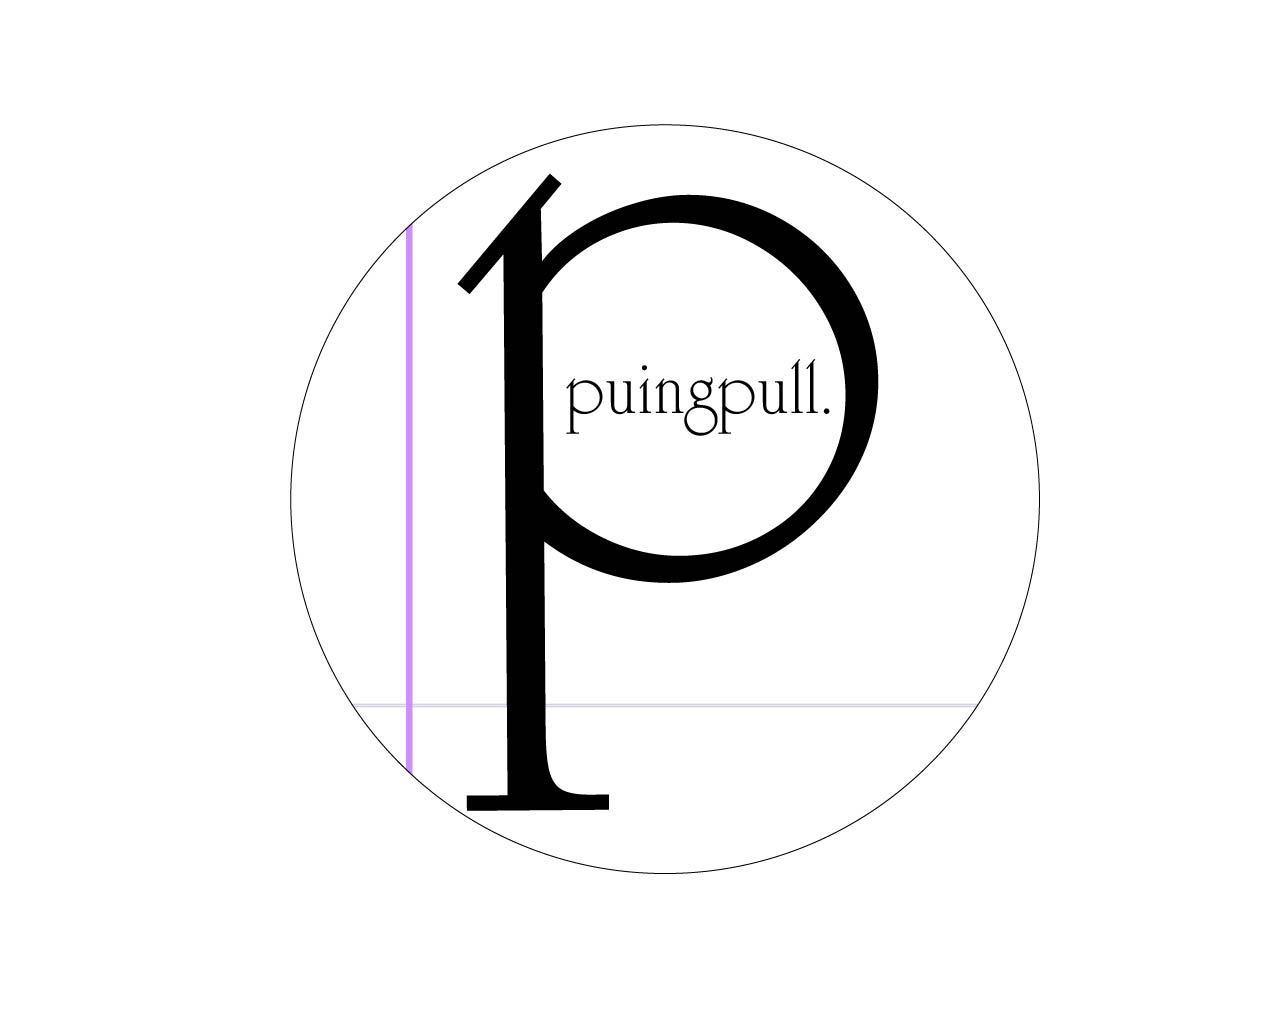 ppuingpull's icon